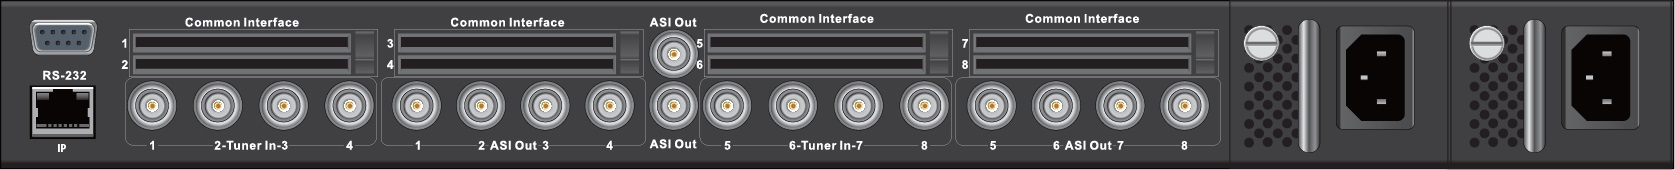 STREAMINGIPTV HEADEND > IRD / Headend receivers IPTV > Antik MX 5308